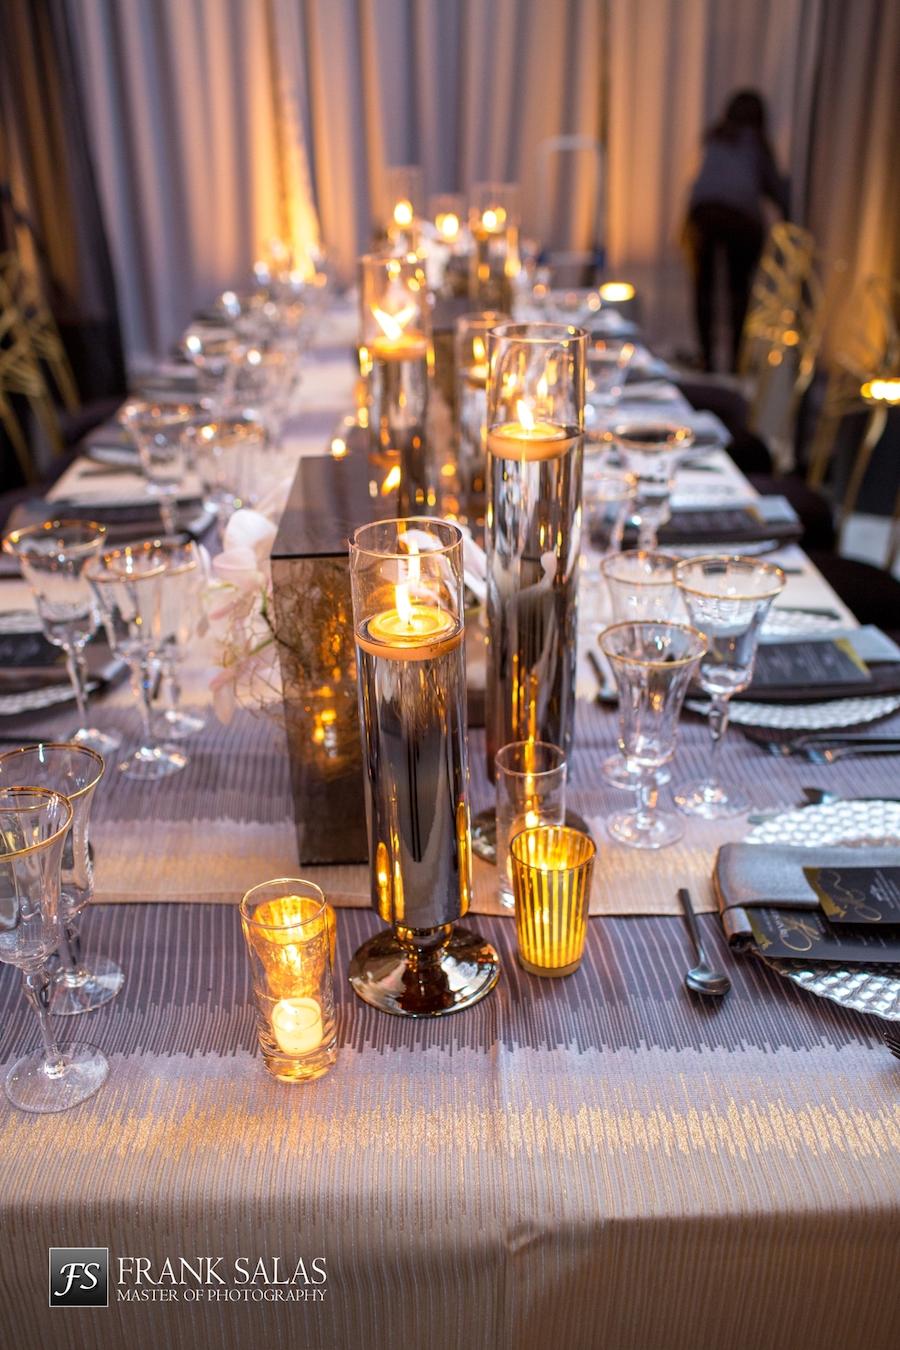 ABC Gala 2017-Shawna-yamamoto-kelsey-events-pasea-hotel-platinum-weddings-by-Kerrie-Frank-Salas-3.jpg